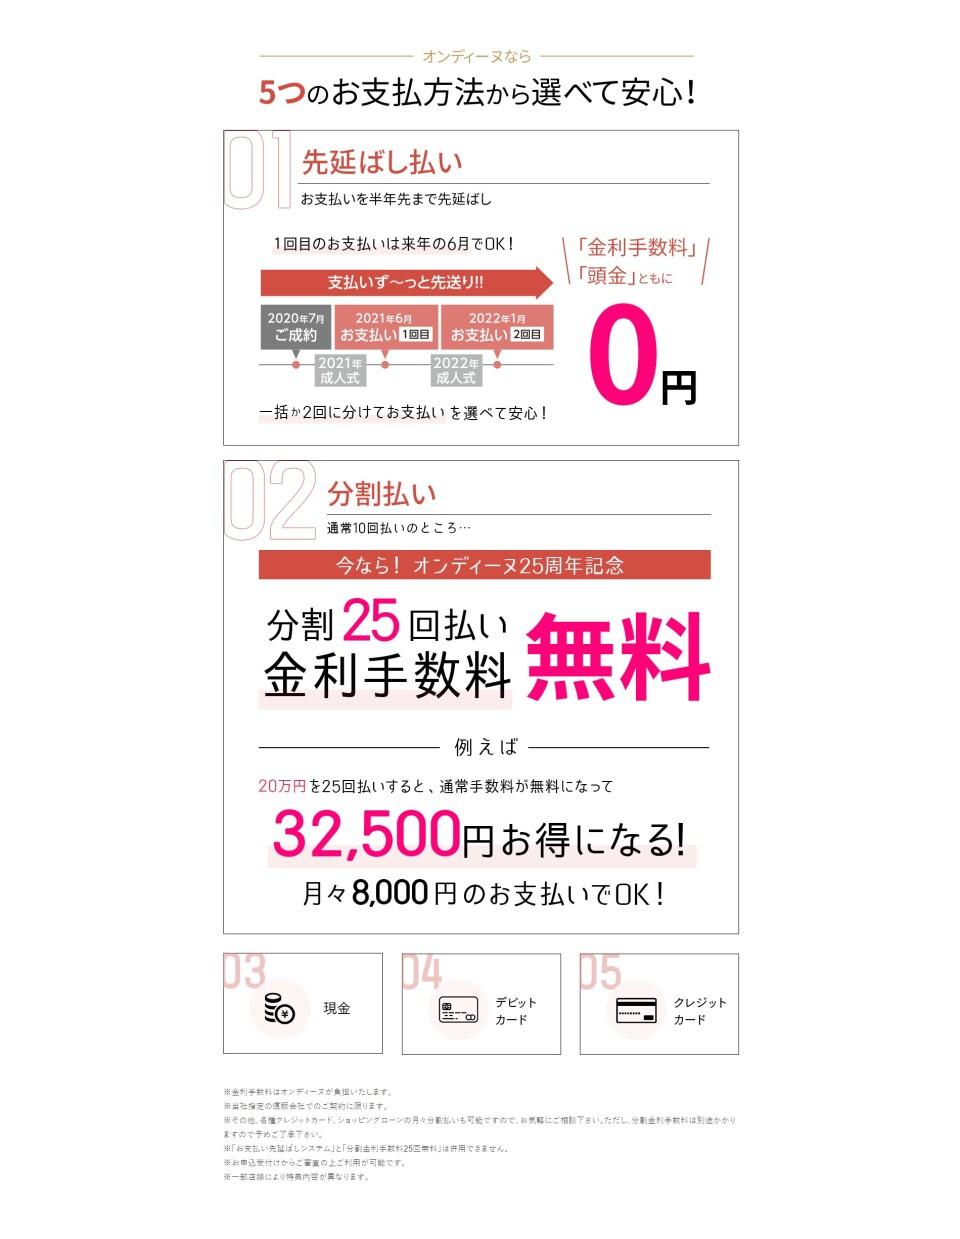 FireShot Capture 269 - 大振袖万博 西日本全域にて開催!|成人式の振袖レンタル・販売オンディーヌ - www.ondine.jp